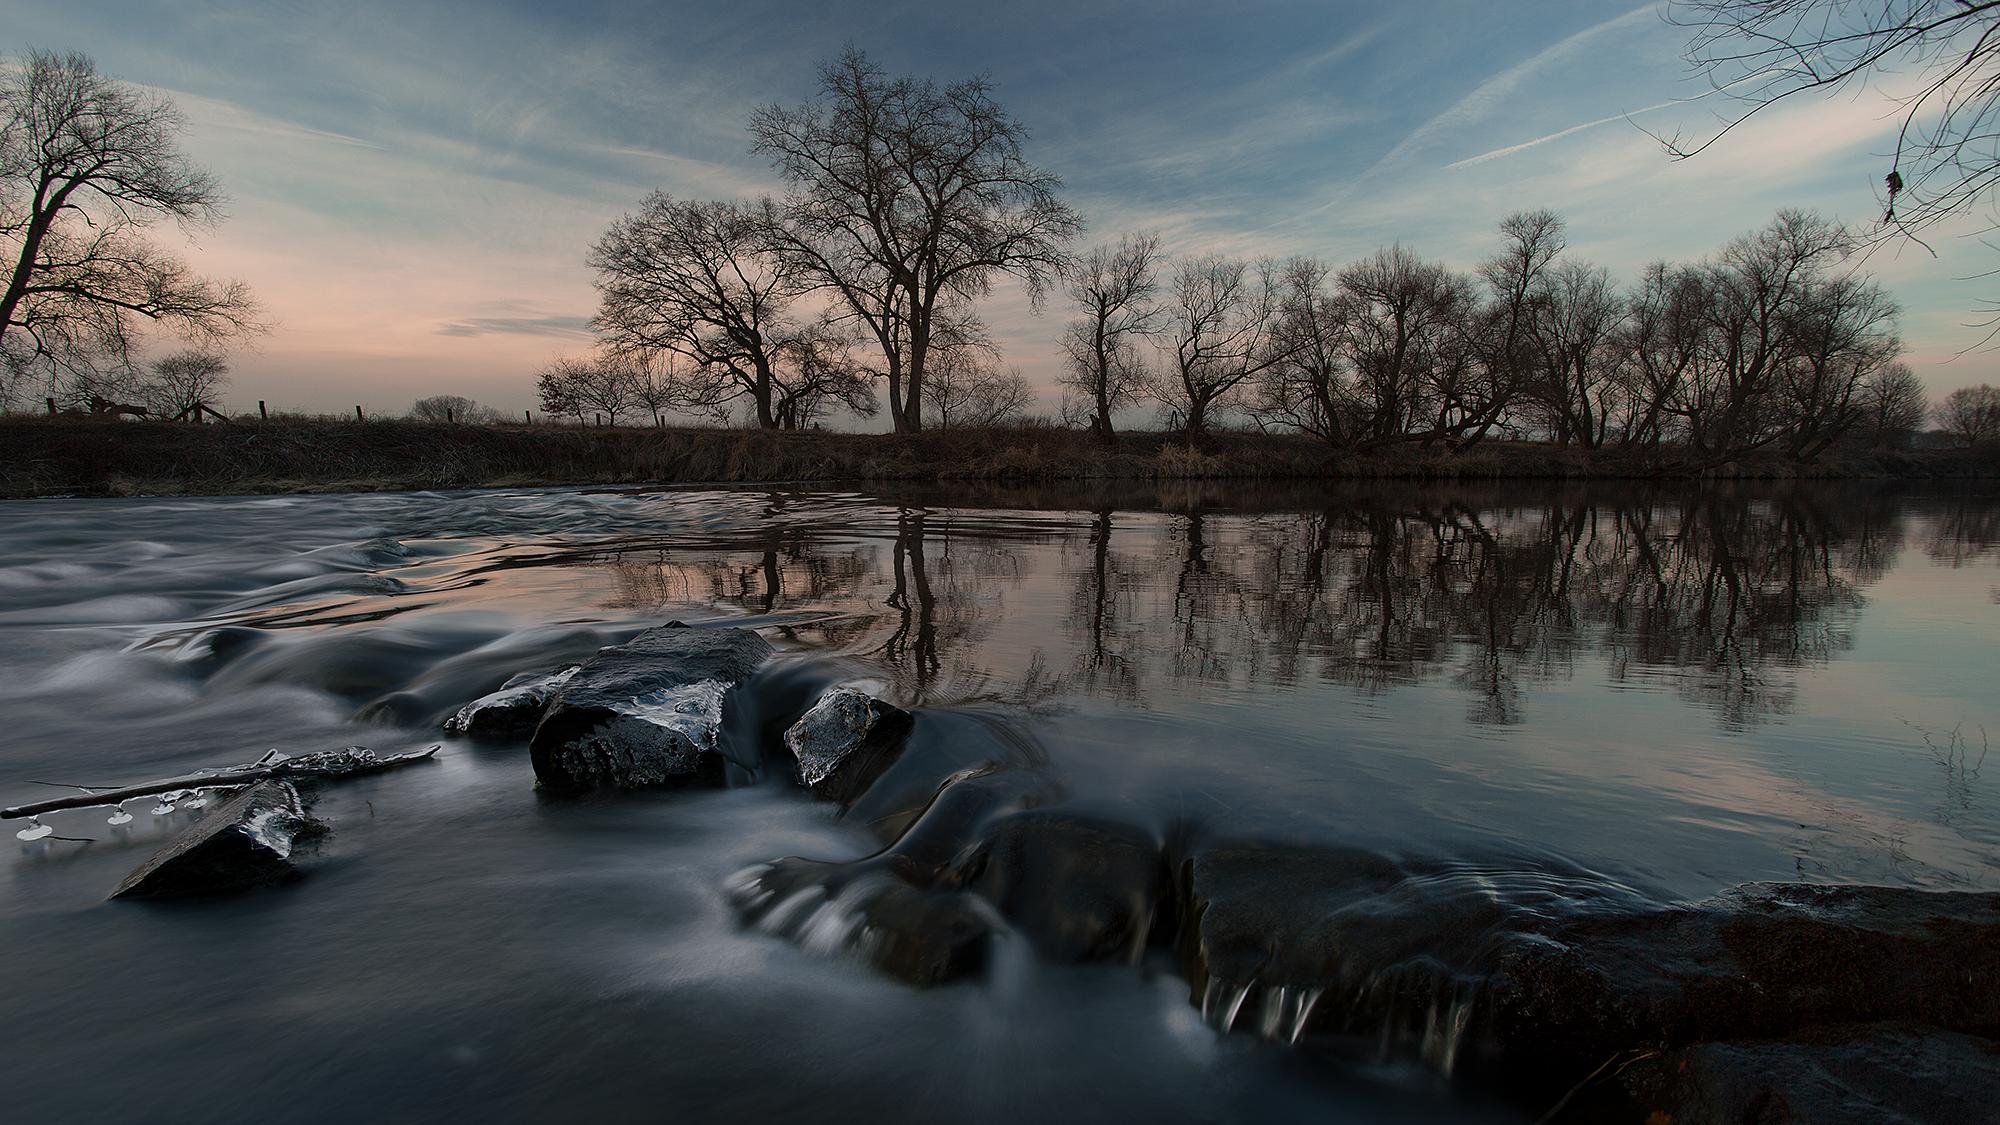 River Sieg, Germany